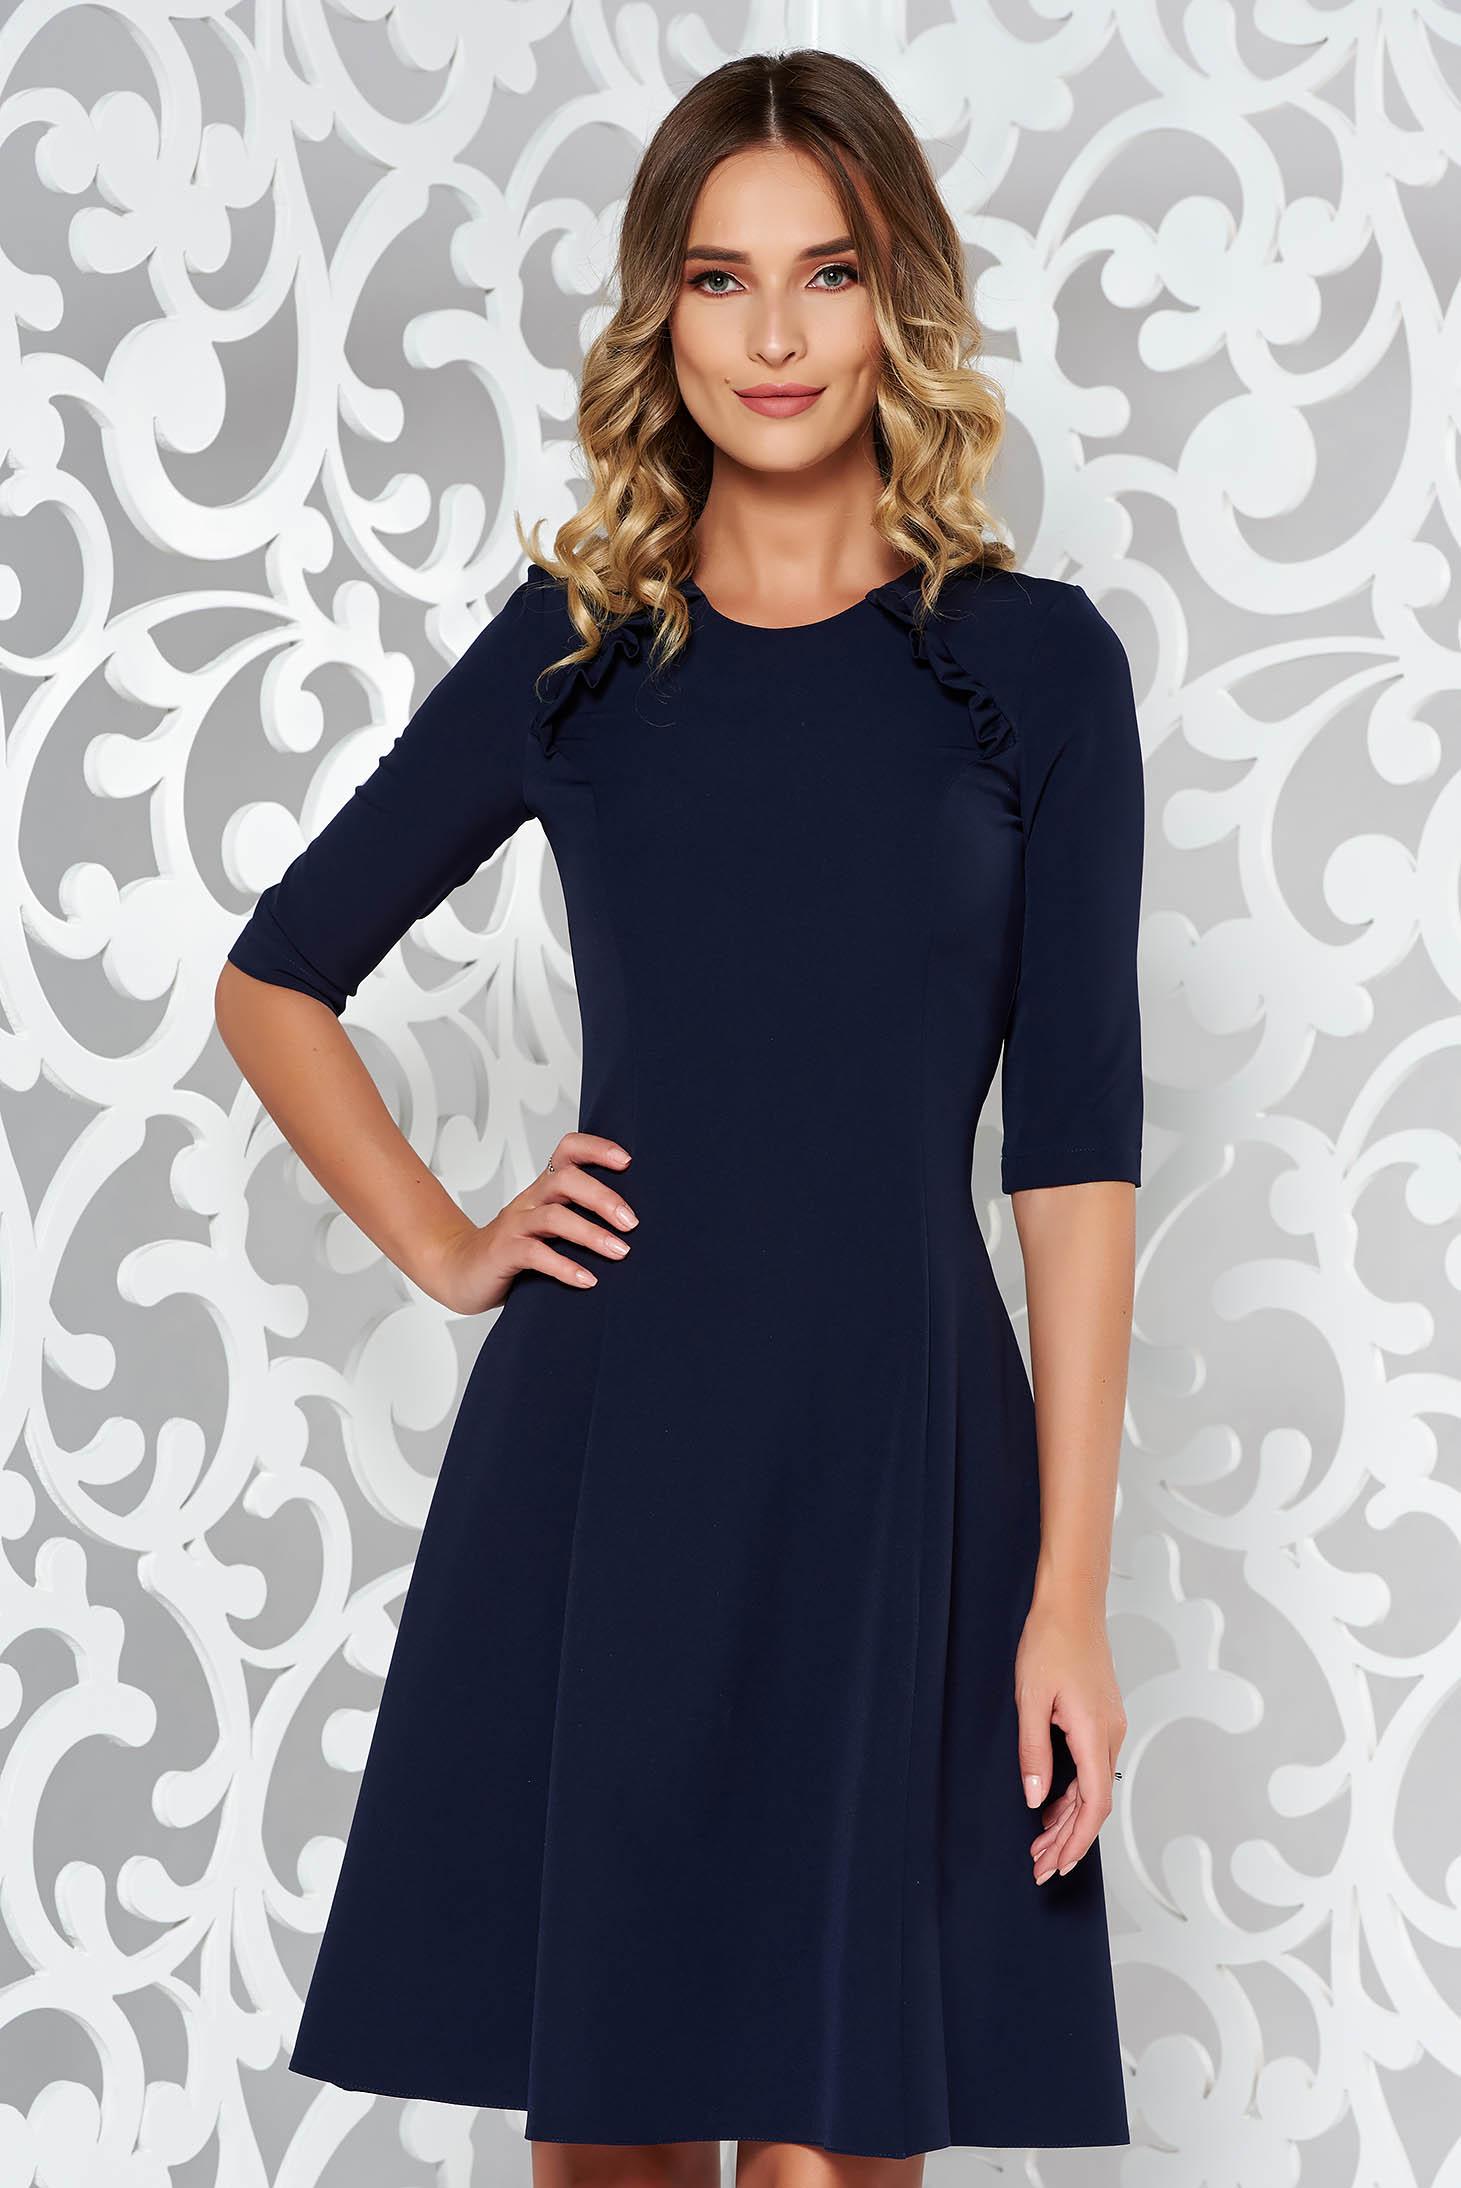 StarShinerS darkblue office midi cloche dress slightly elastic fabric with ruffle details